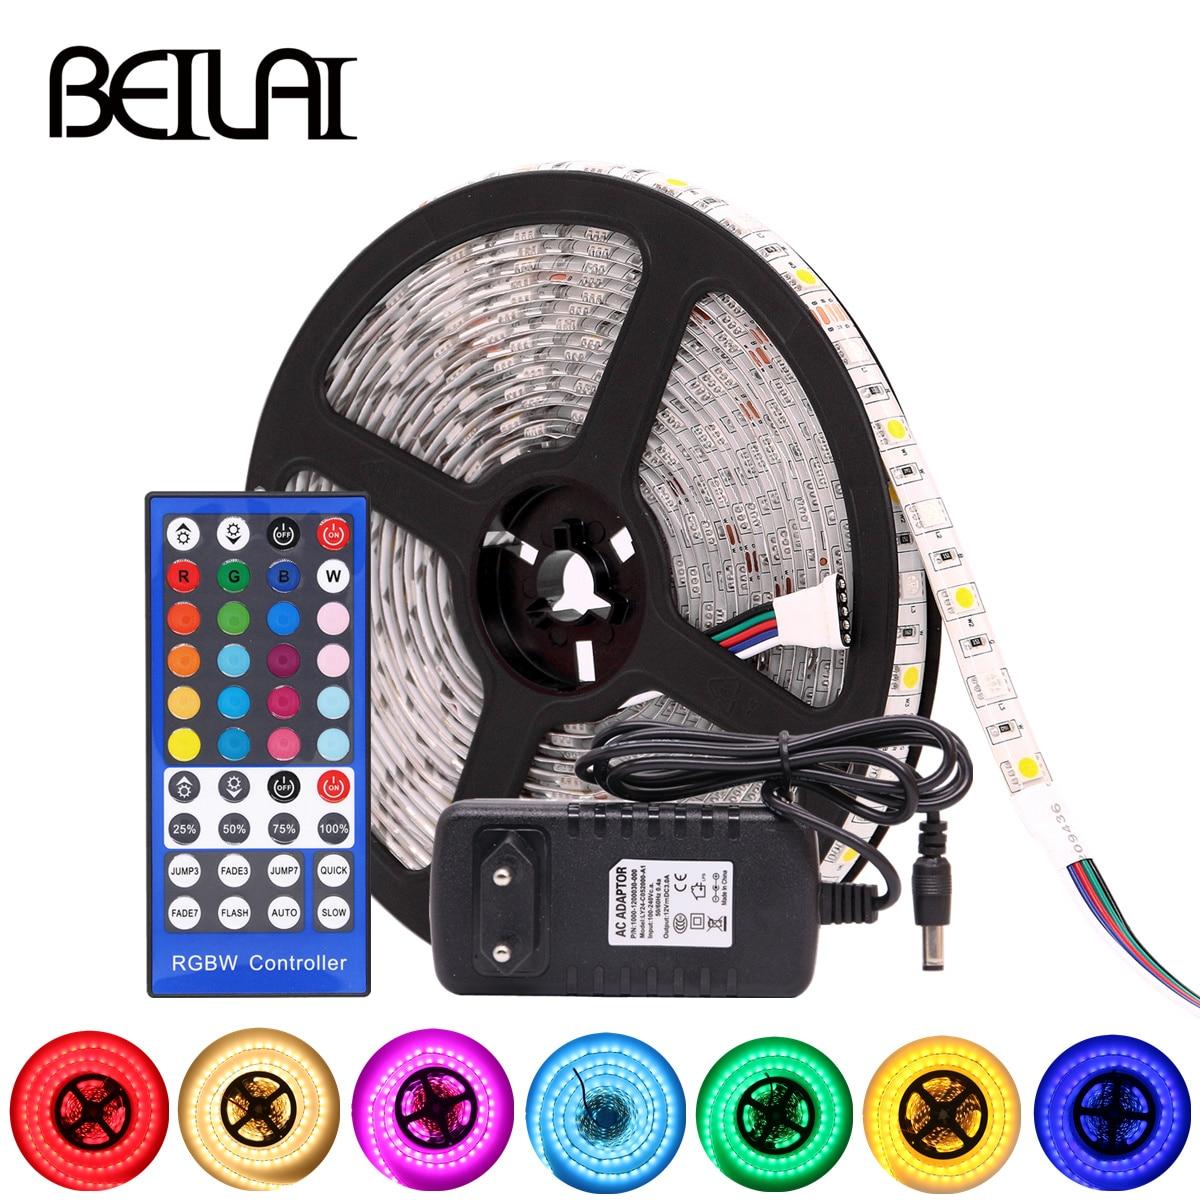 BEILAI SMD 5050 RGB LED Strip Waterproof DC 12V 5M 300LED RGBW RGBWW LED Light Strips Fl ...